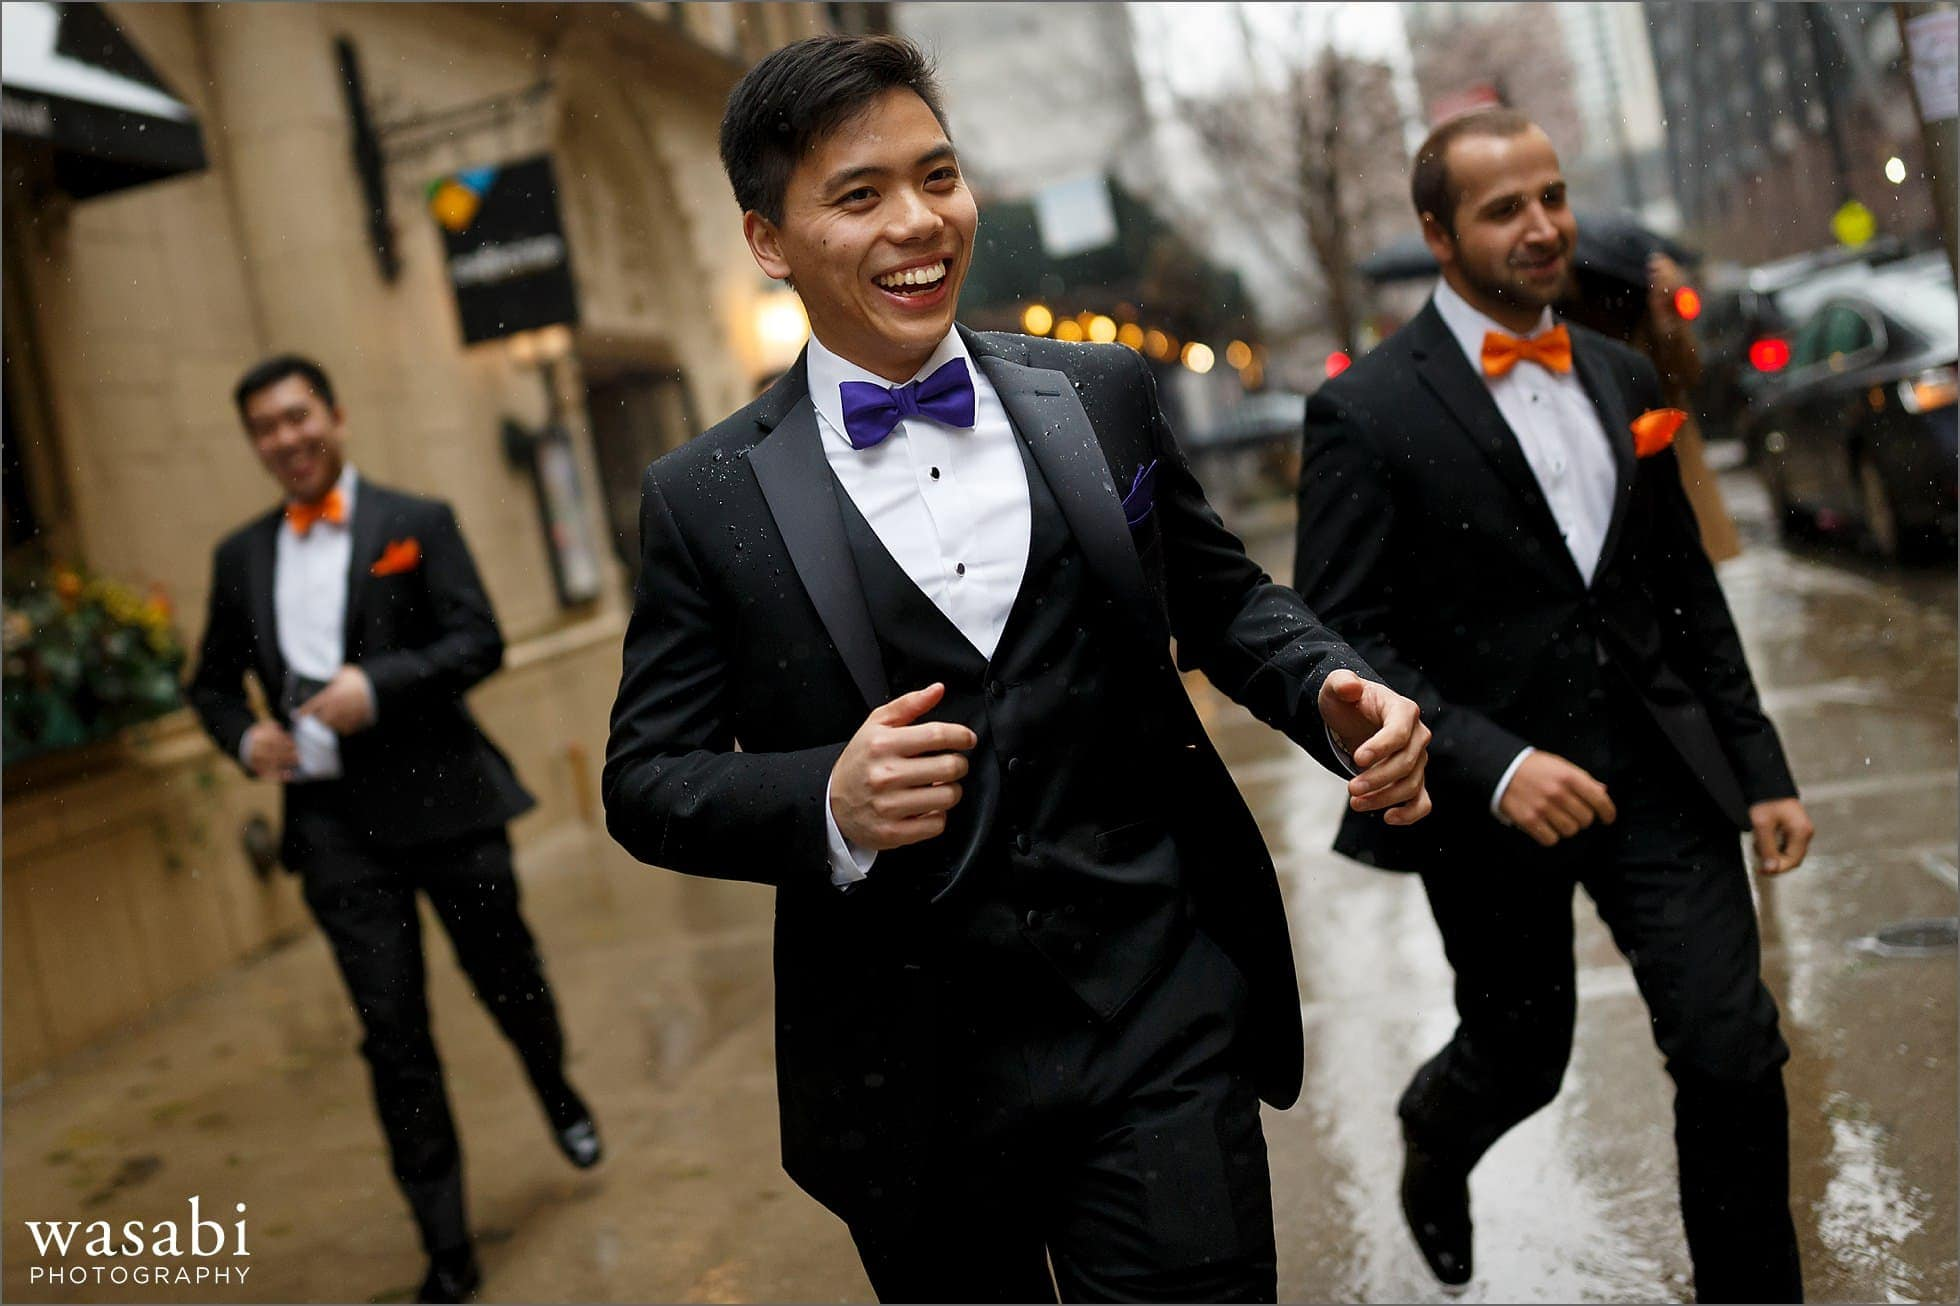 groom and groomsemen run through rain on wedding day